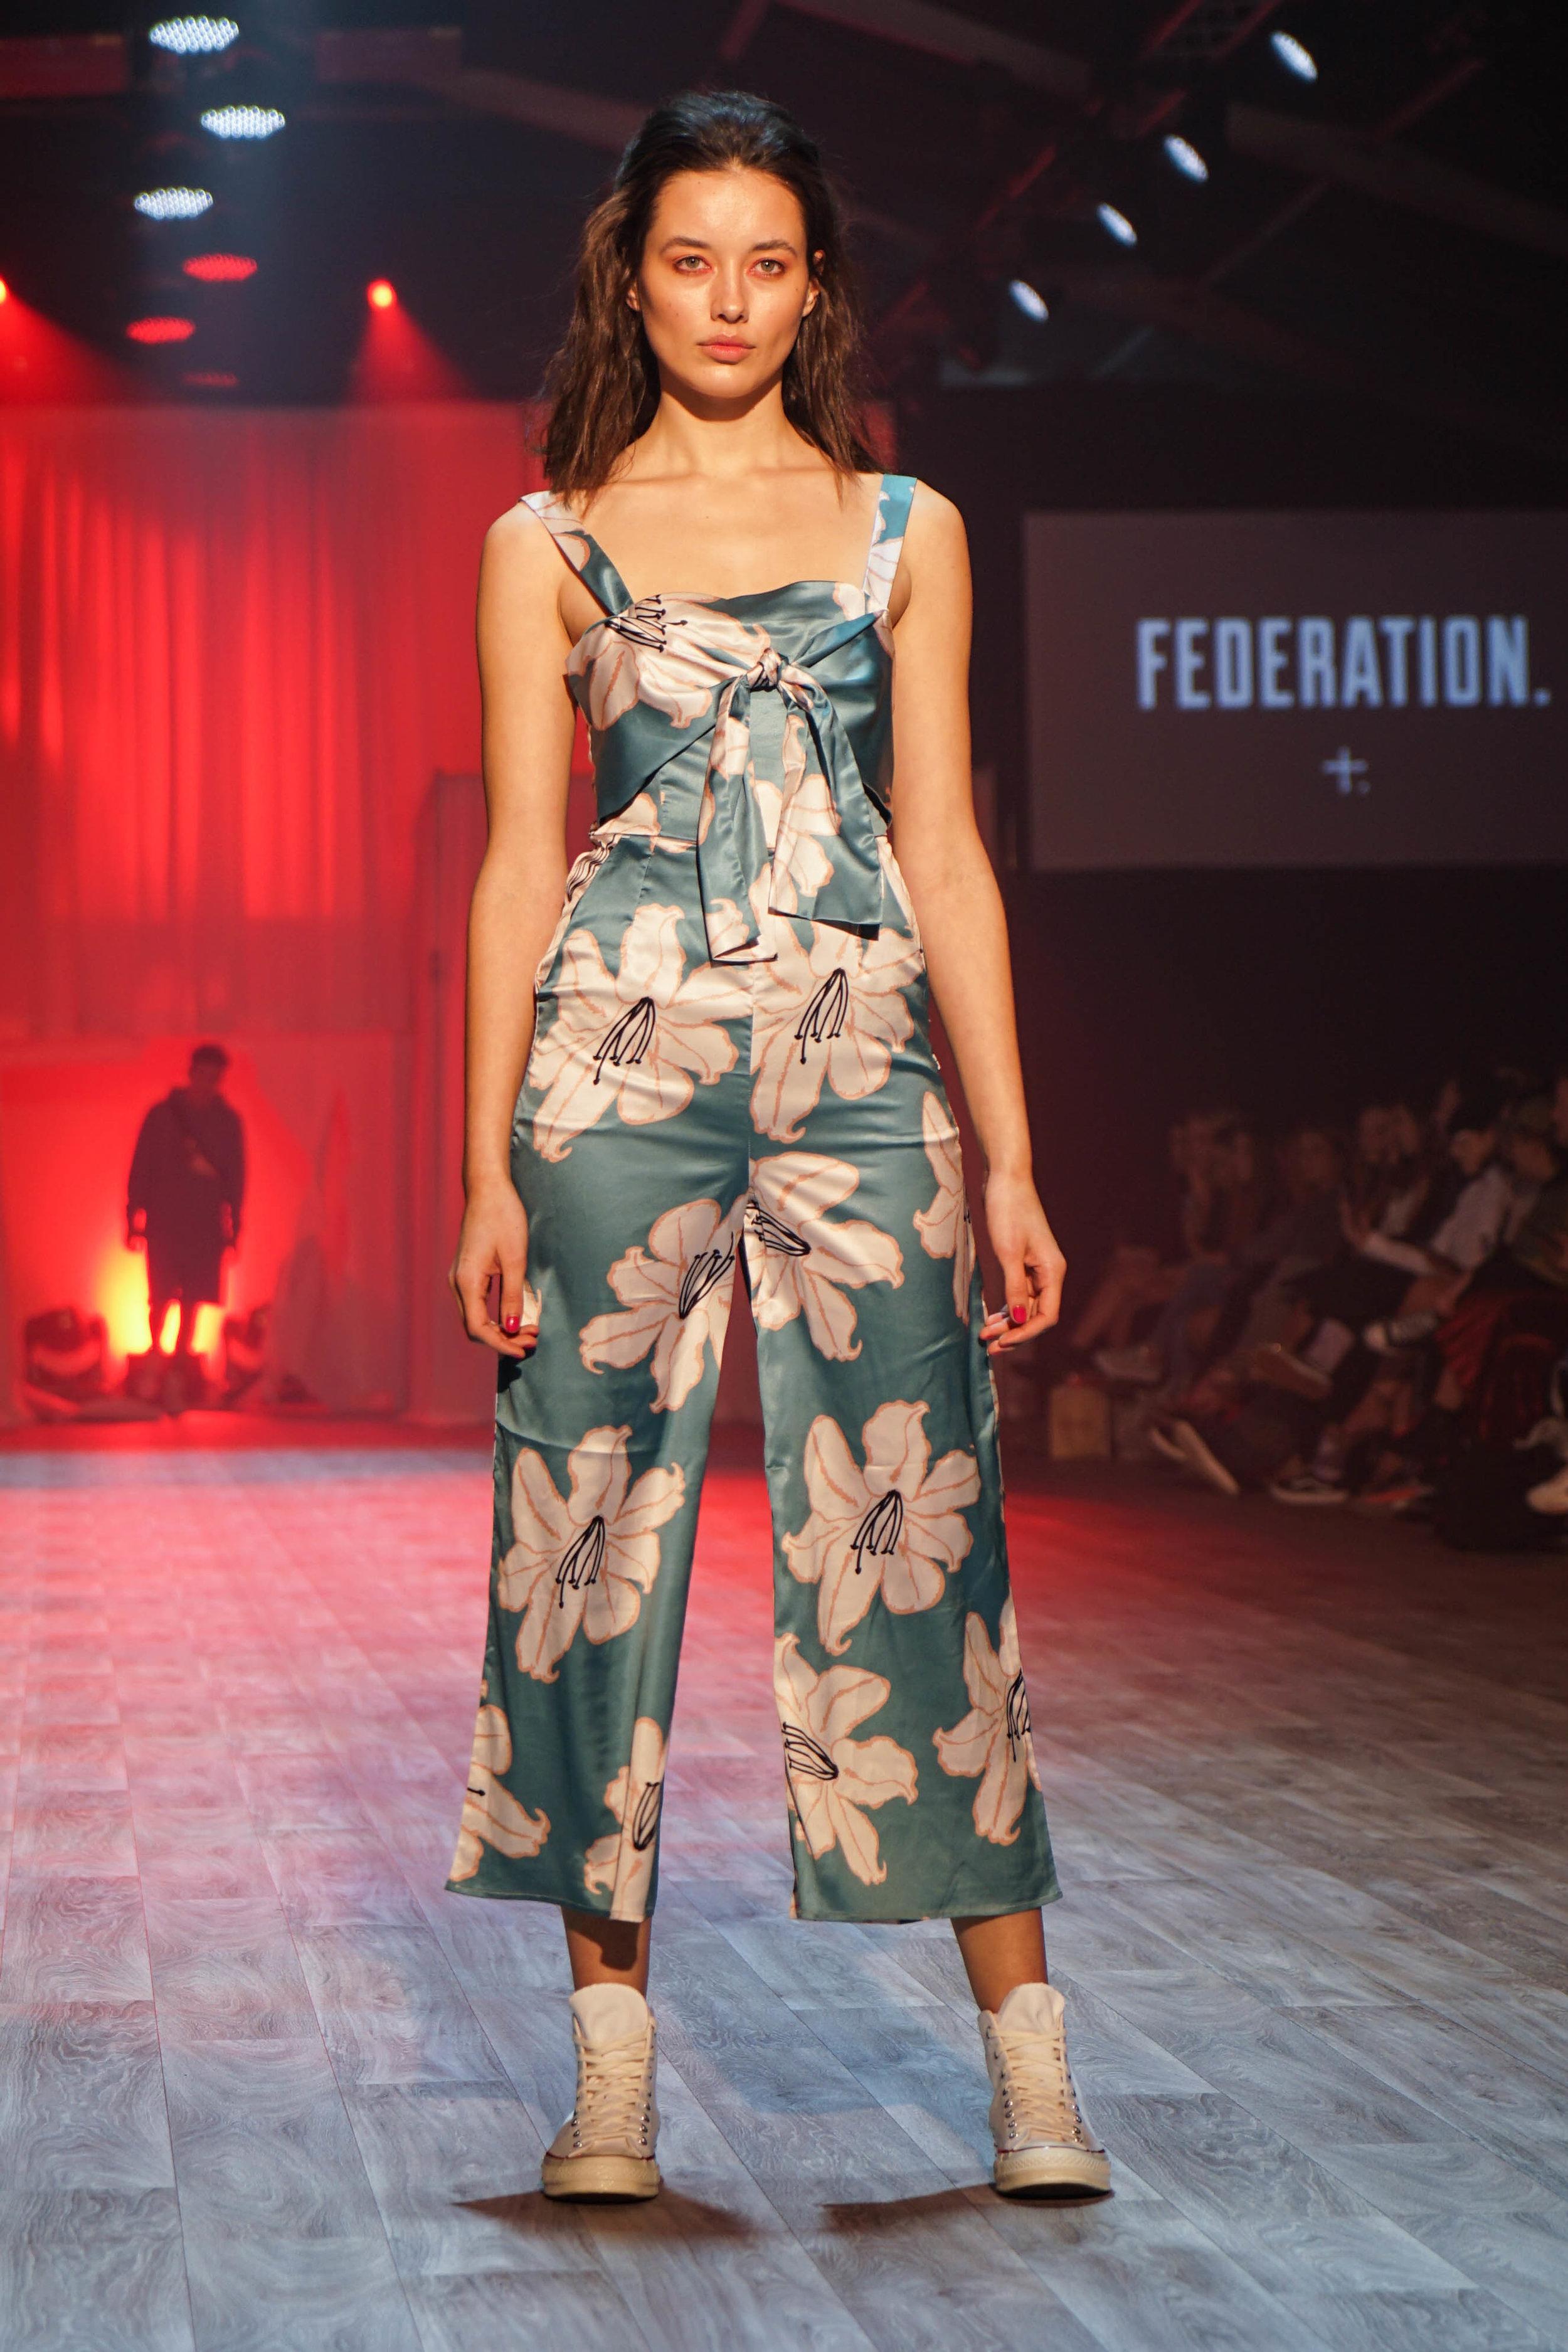 SarahJaneLousieStringer_Runway_Federation_2019PhotoComp-02593.jpg